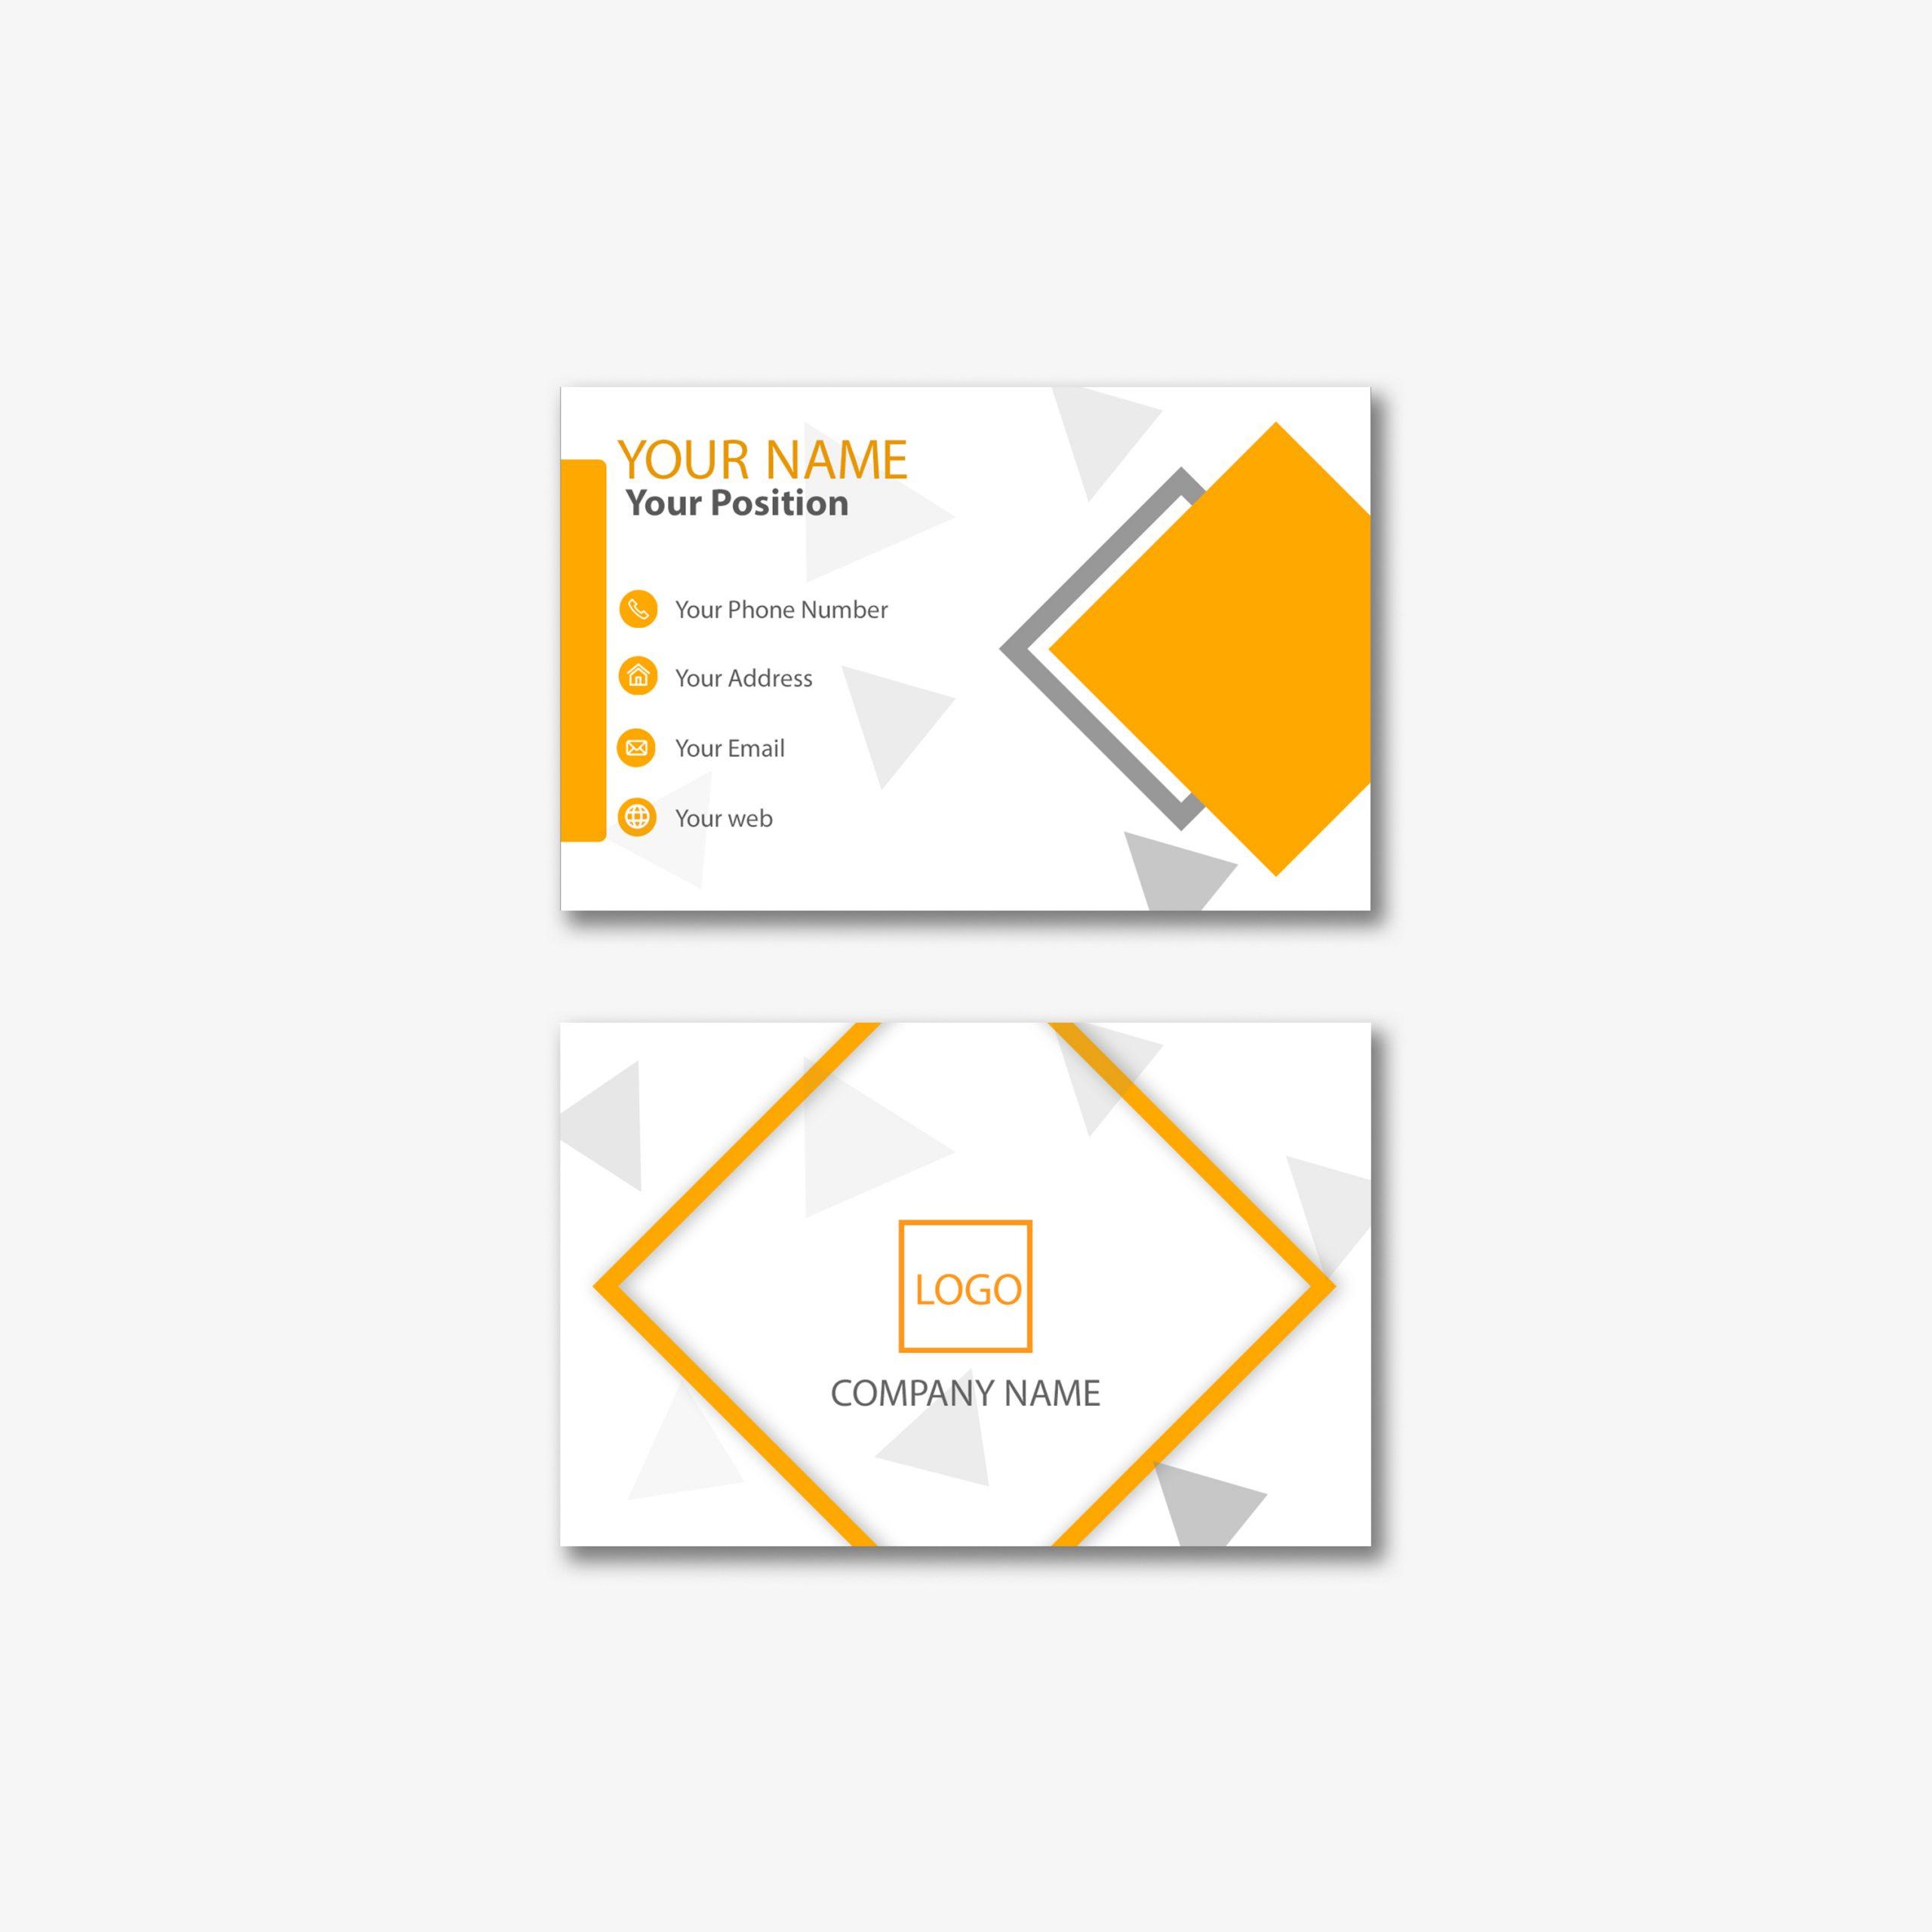 3031331 scaled - کارت ویزیت شرکتی لایه باز